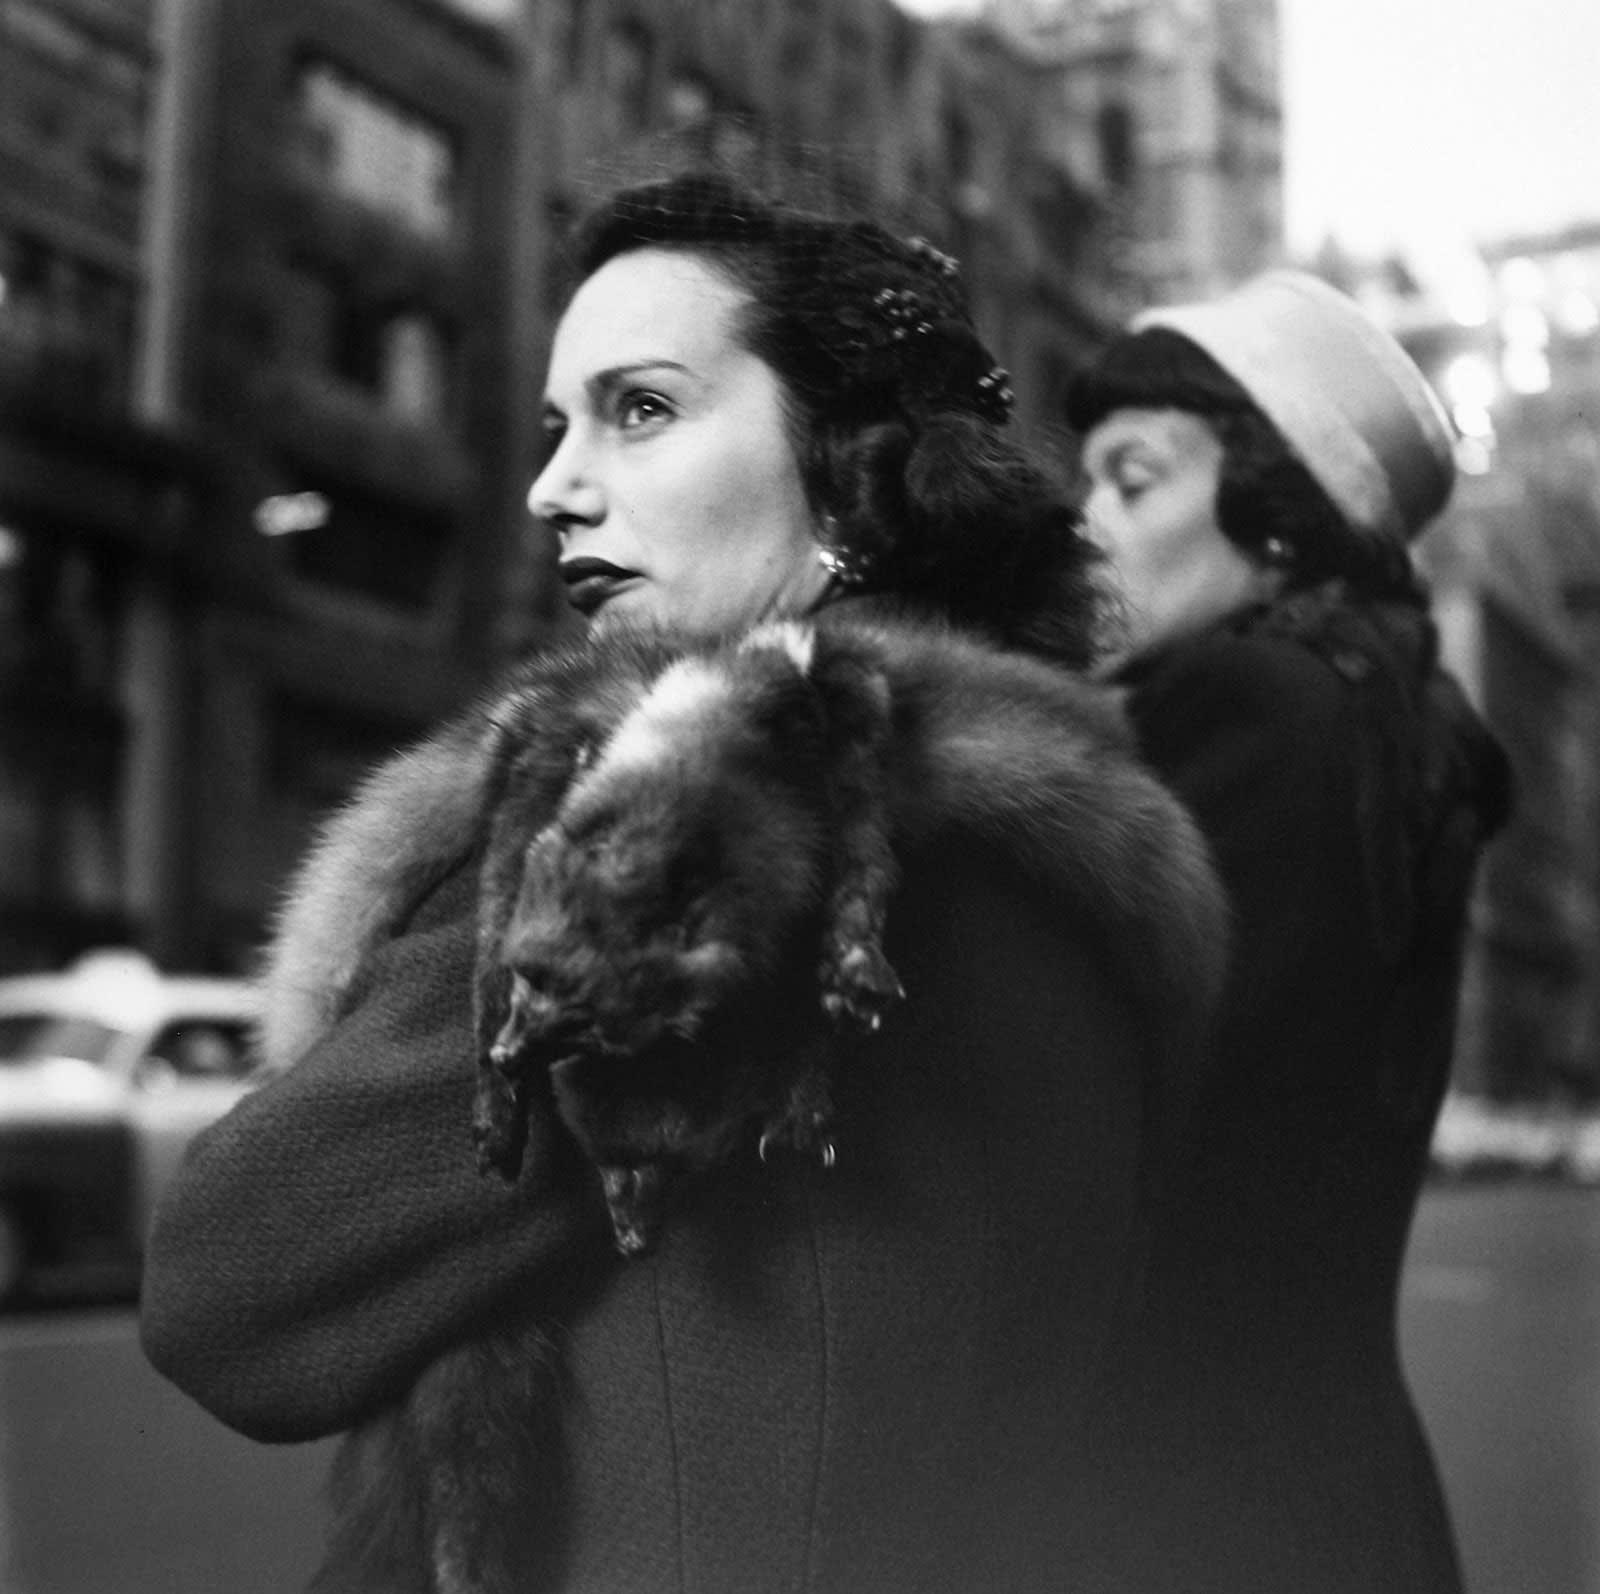 Vivian Maier, New York, NY, Dec. 2, 1954